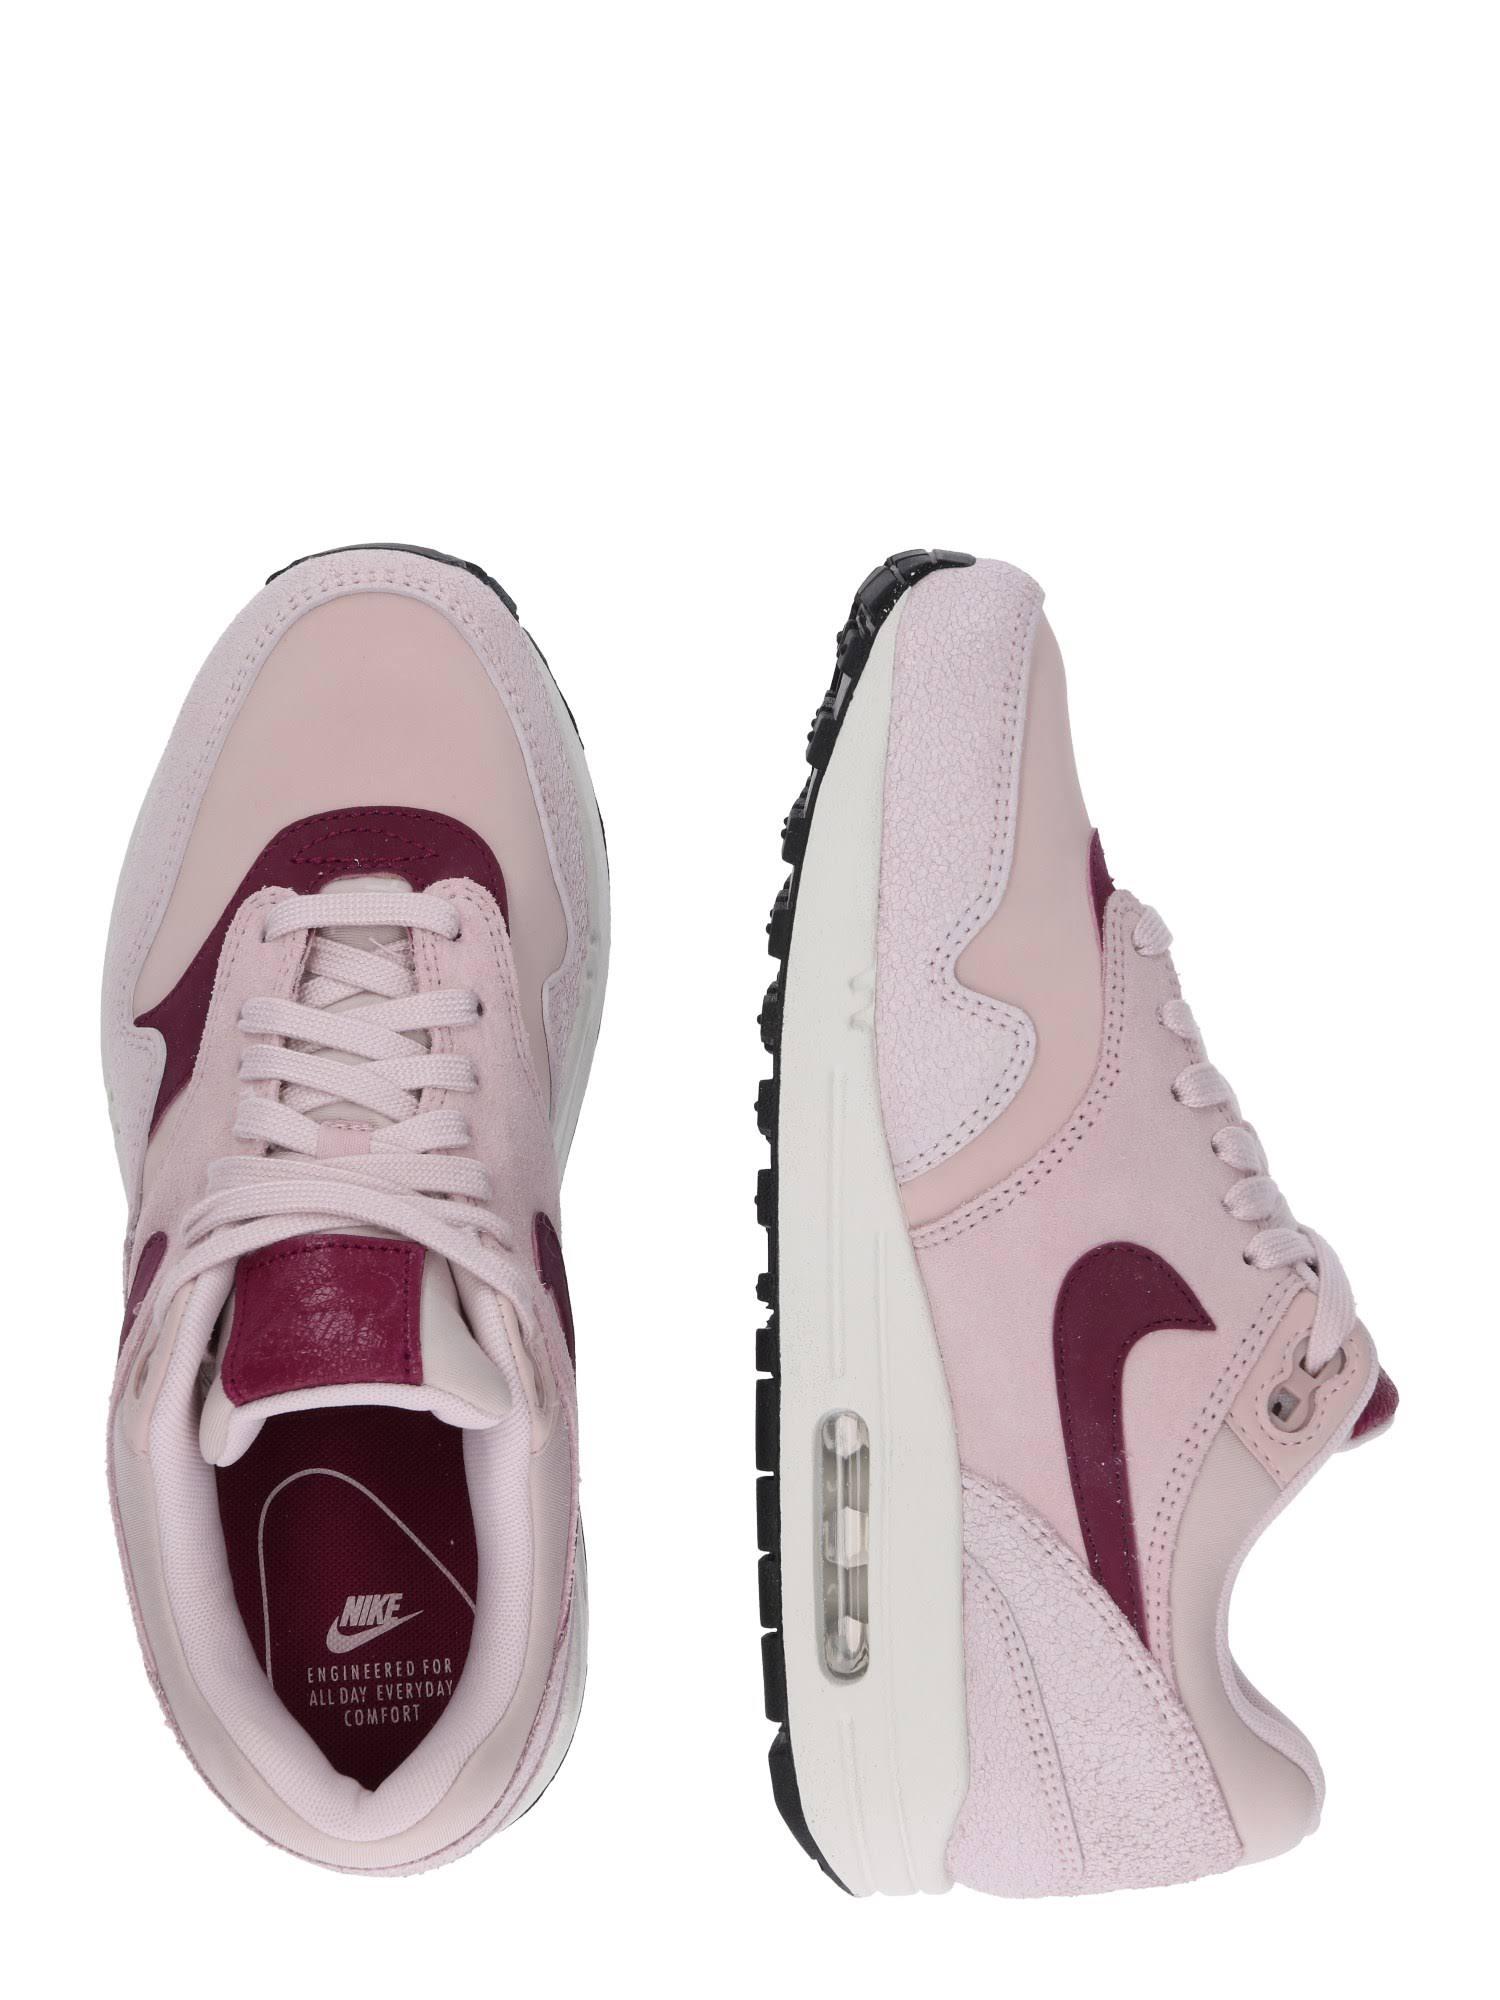 Damenschuh White Air 1 Barely Pink Rose Premium Nike true Berry summit Max wIPxTEdIq